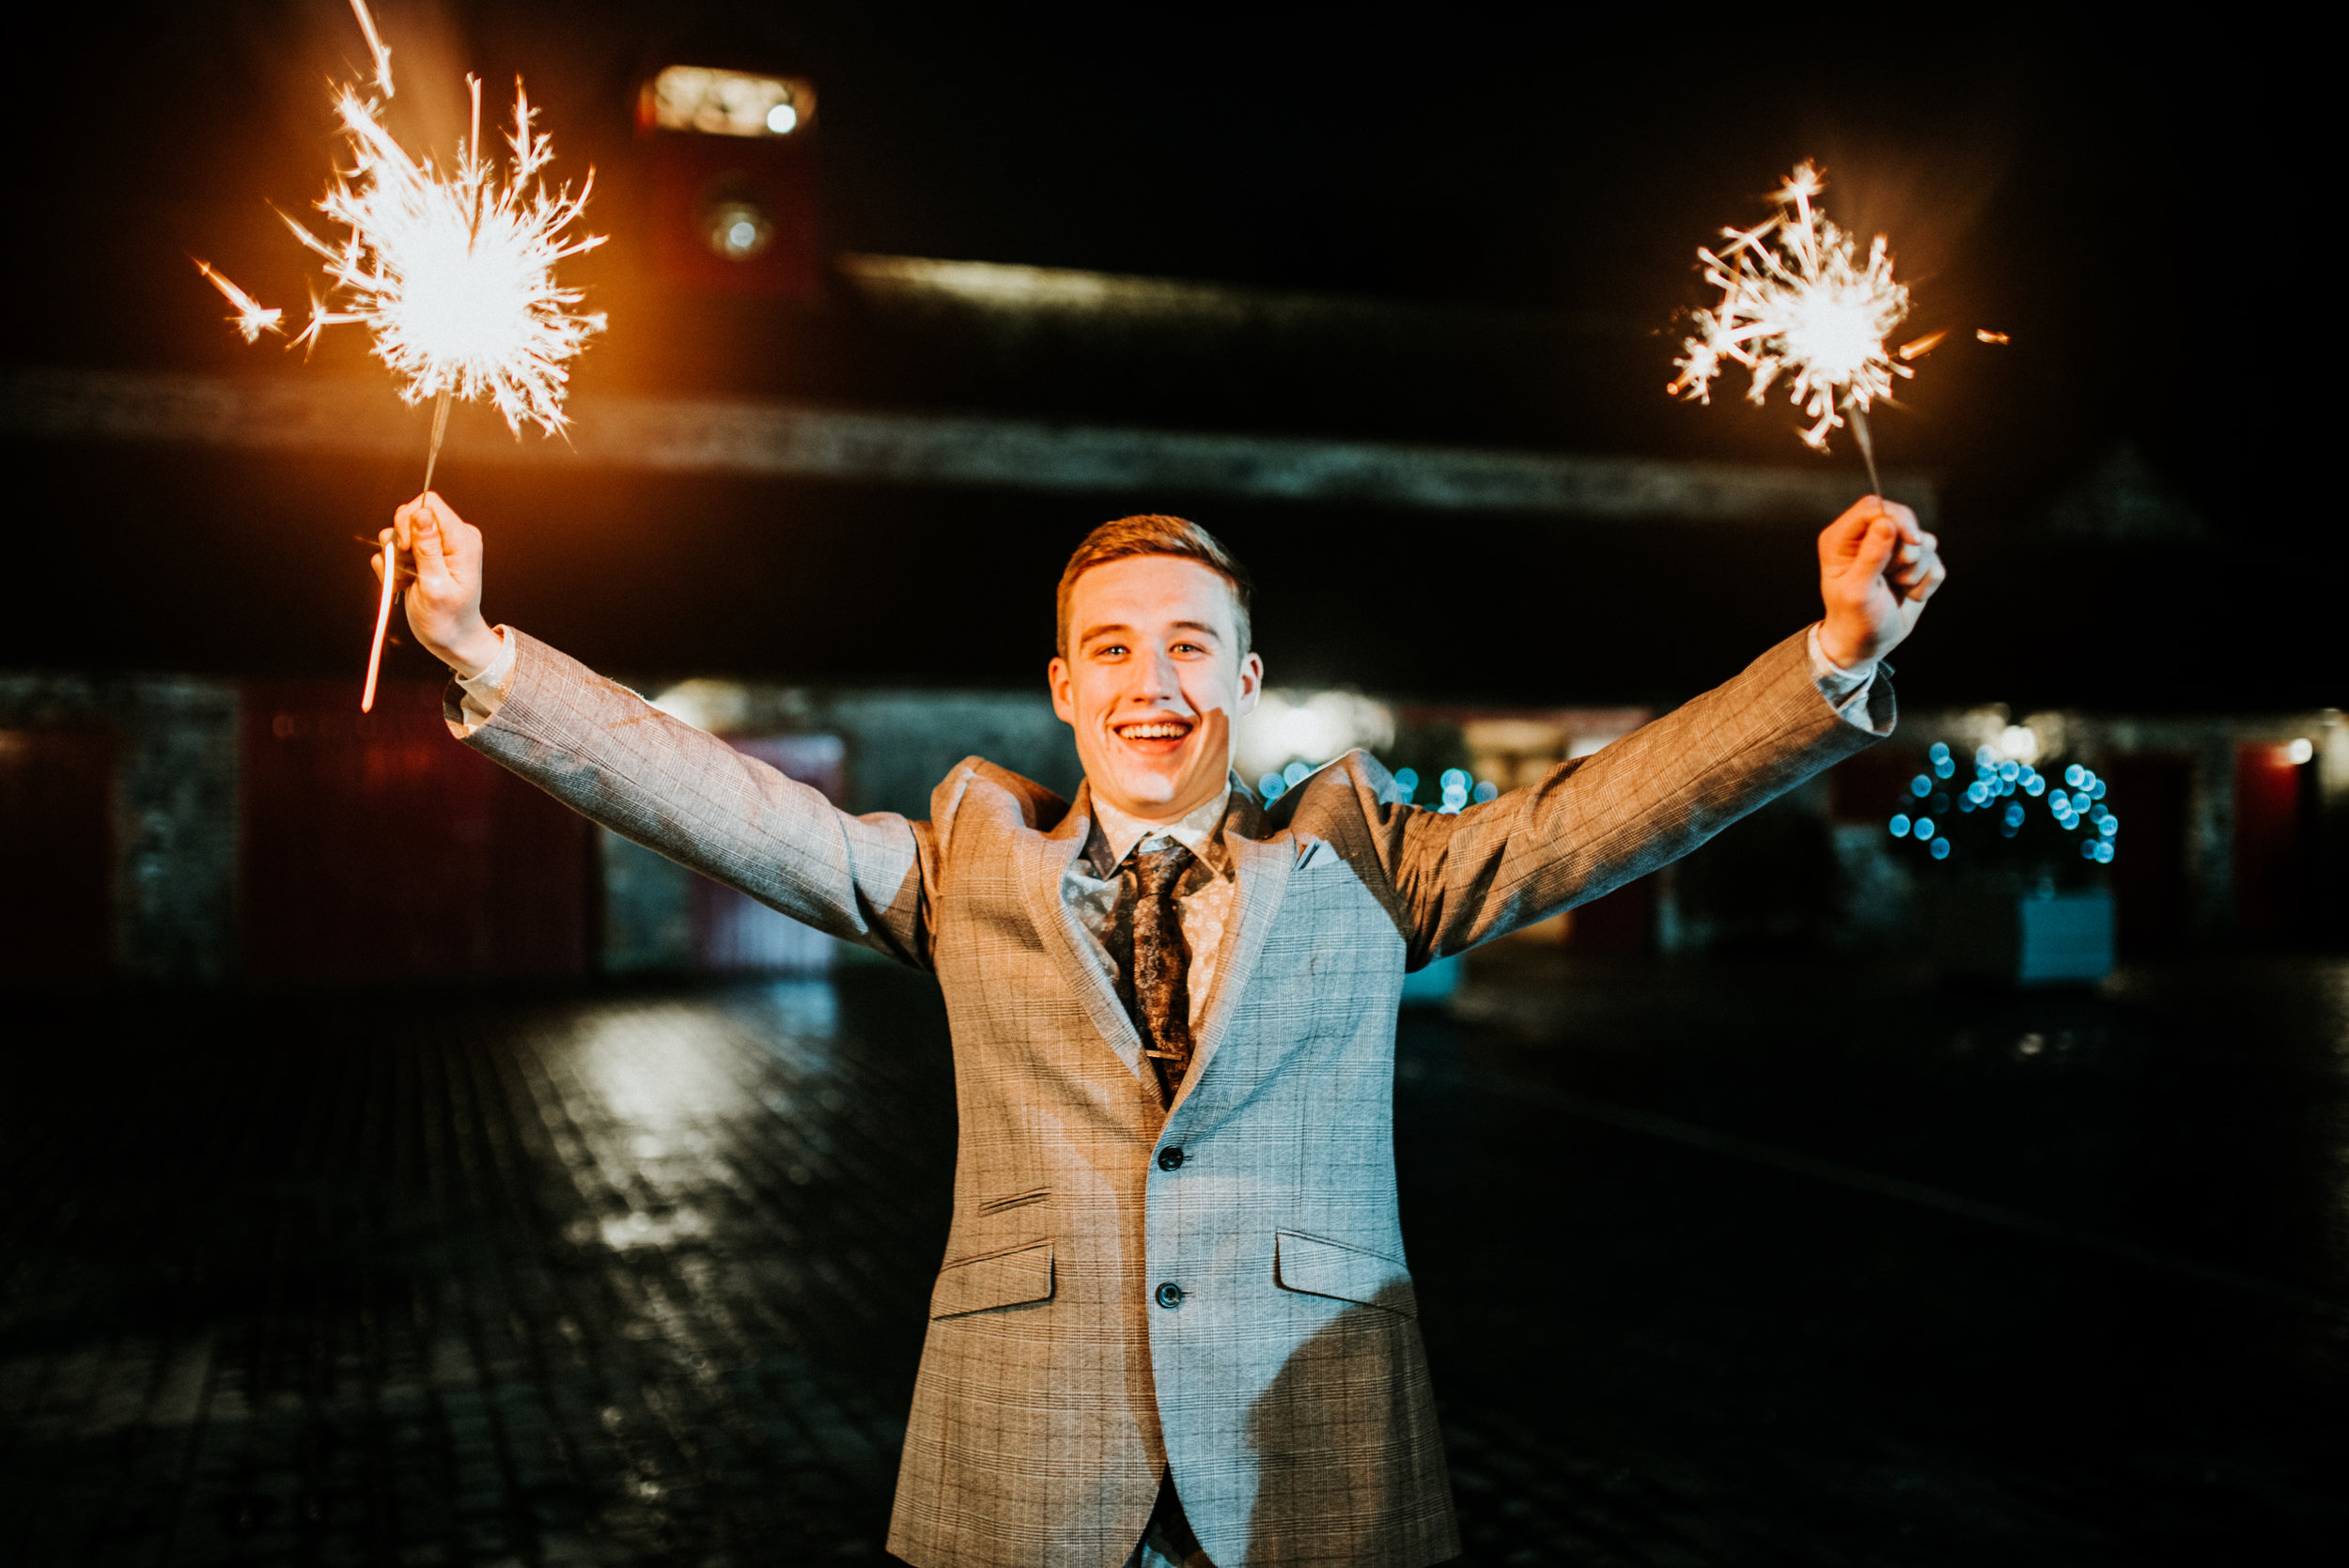 larchfield estate wedding, wedding venues northern ireland, barn wedding venues northern ireland, wedding photos larchfield estate, shane todd wedding, wedding sparklers, irish wedding (6).jpg